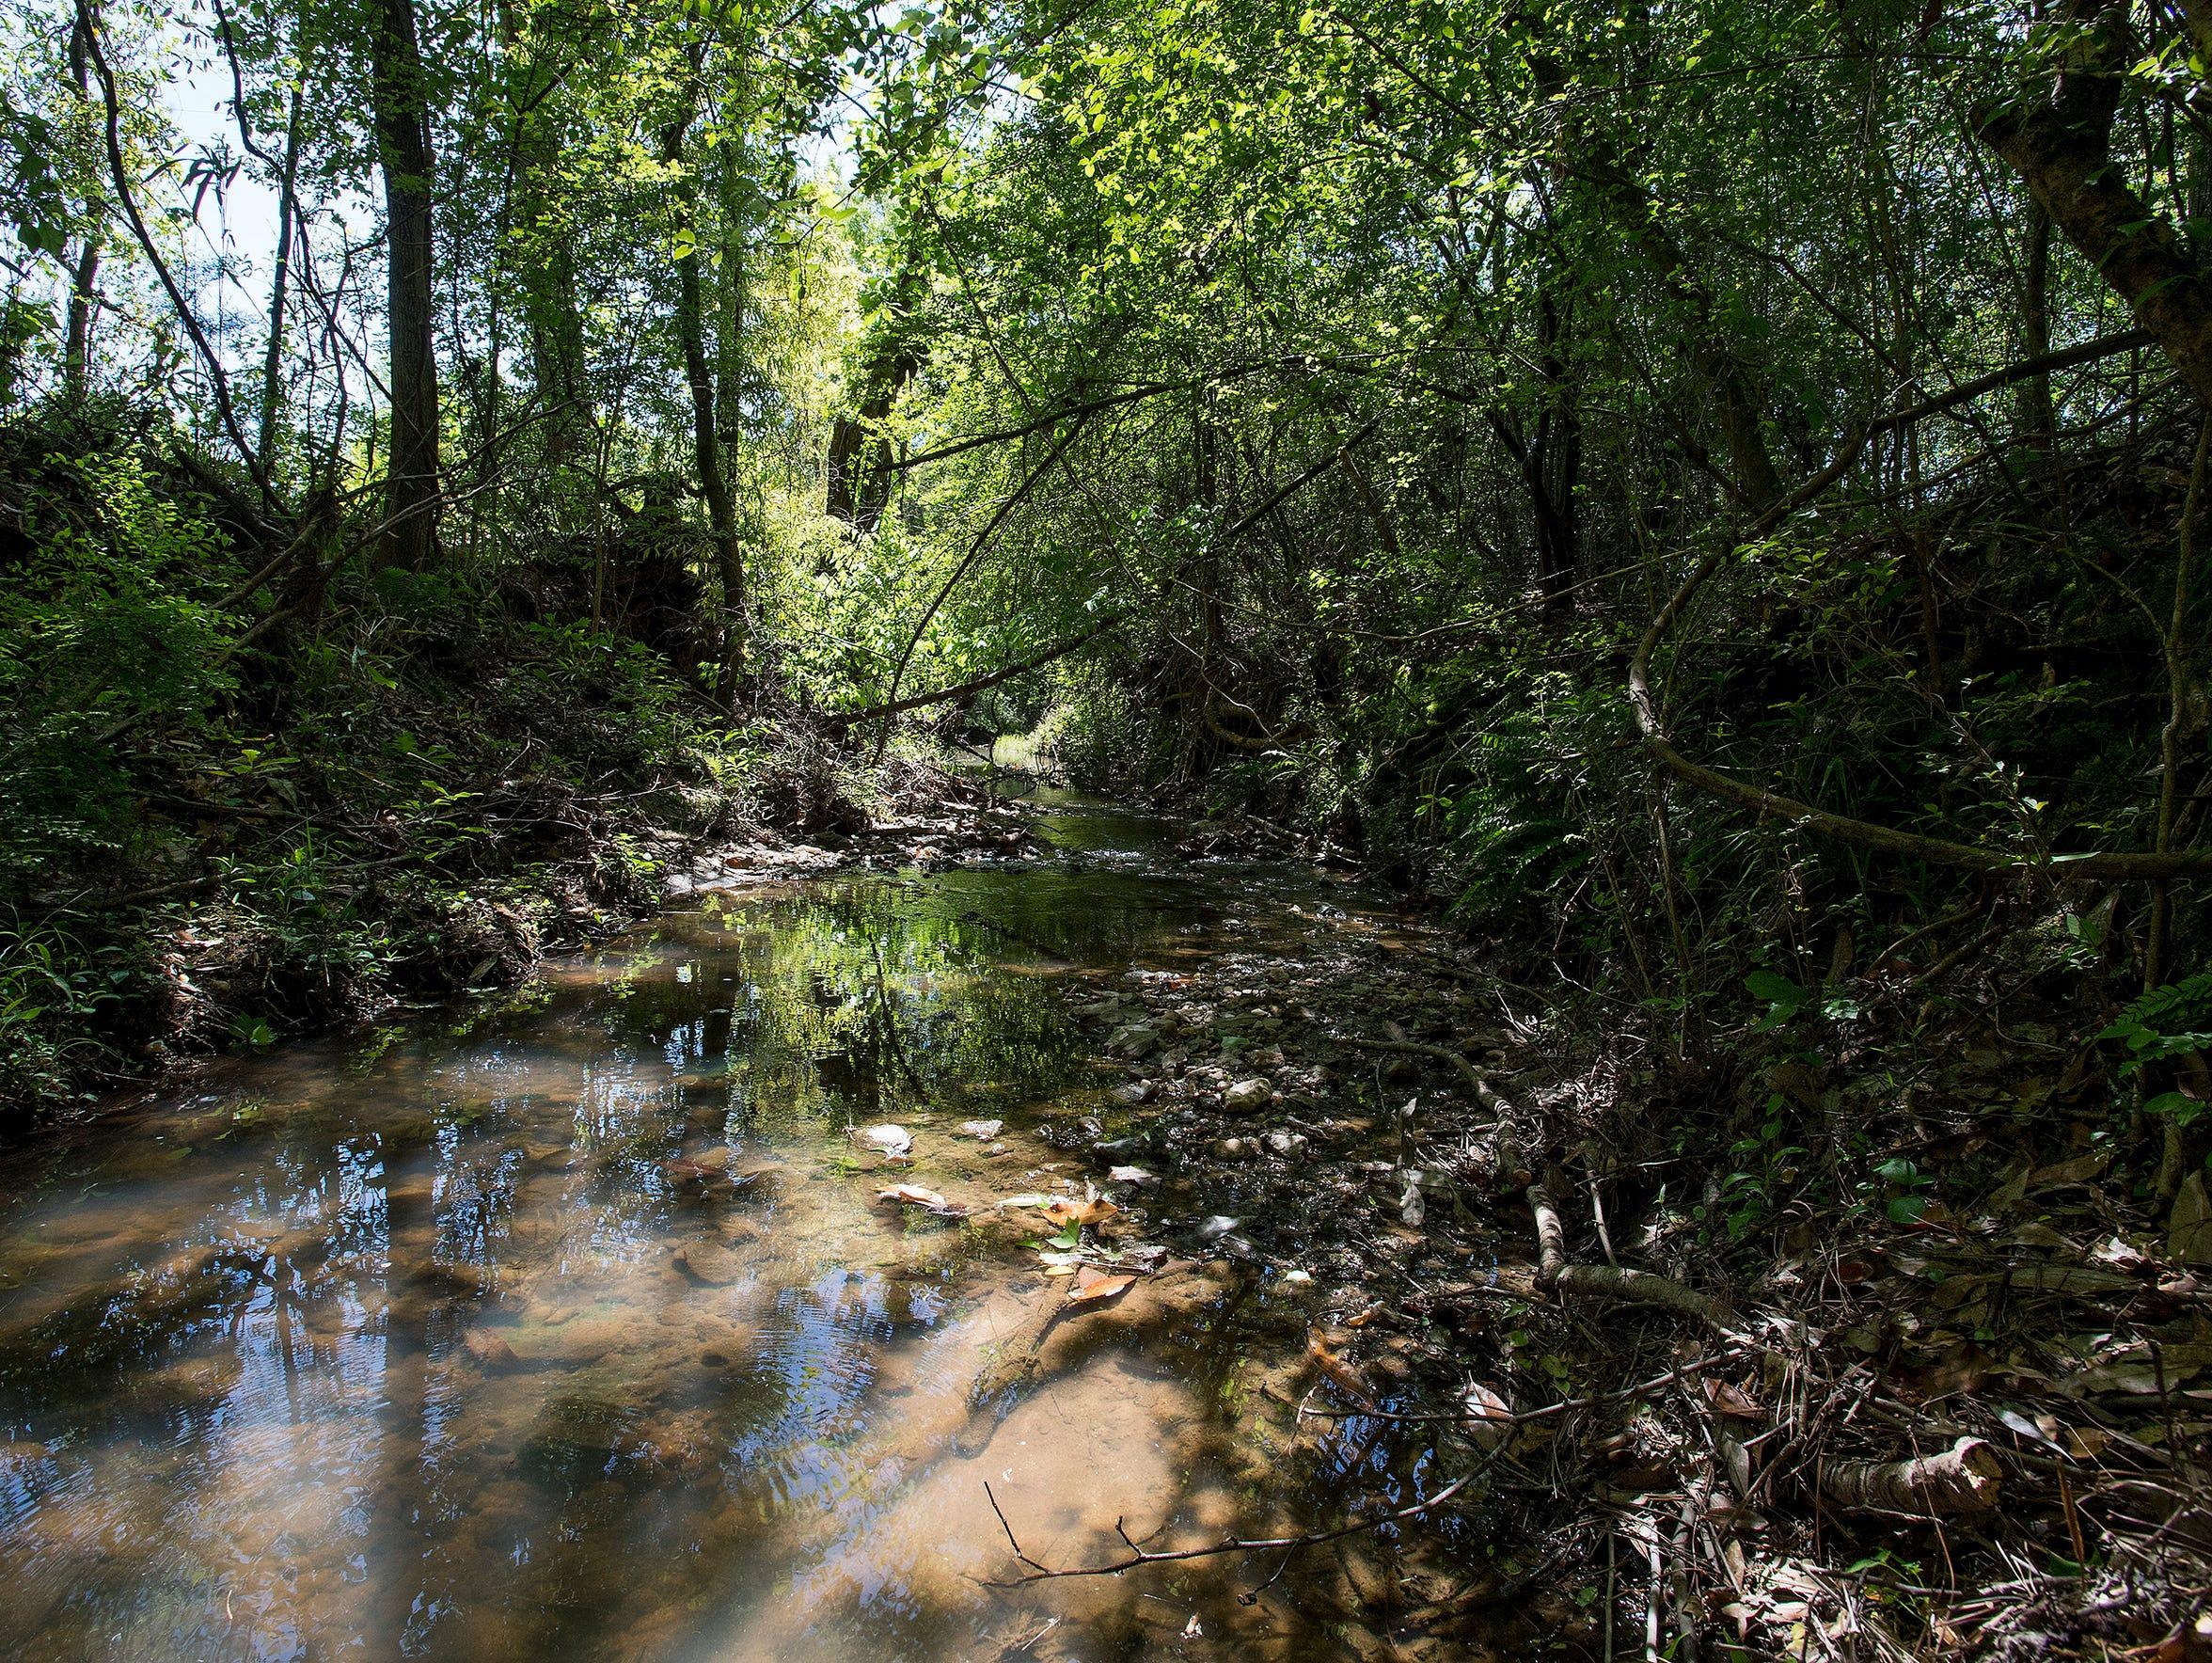 The woods in Elmore County, Ala. near where Robin White